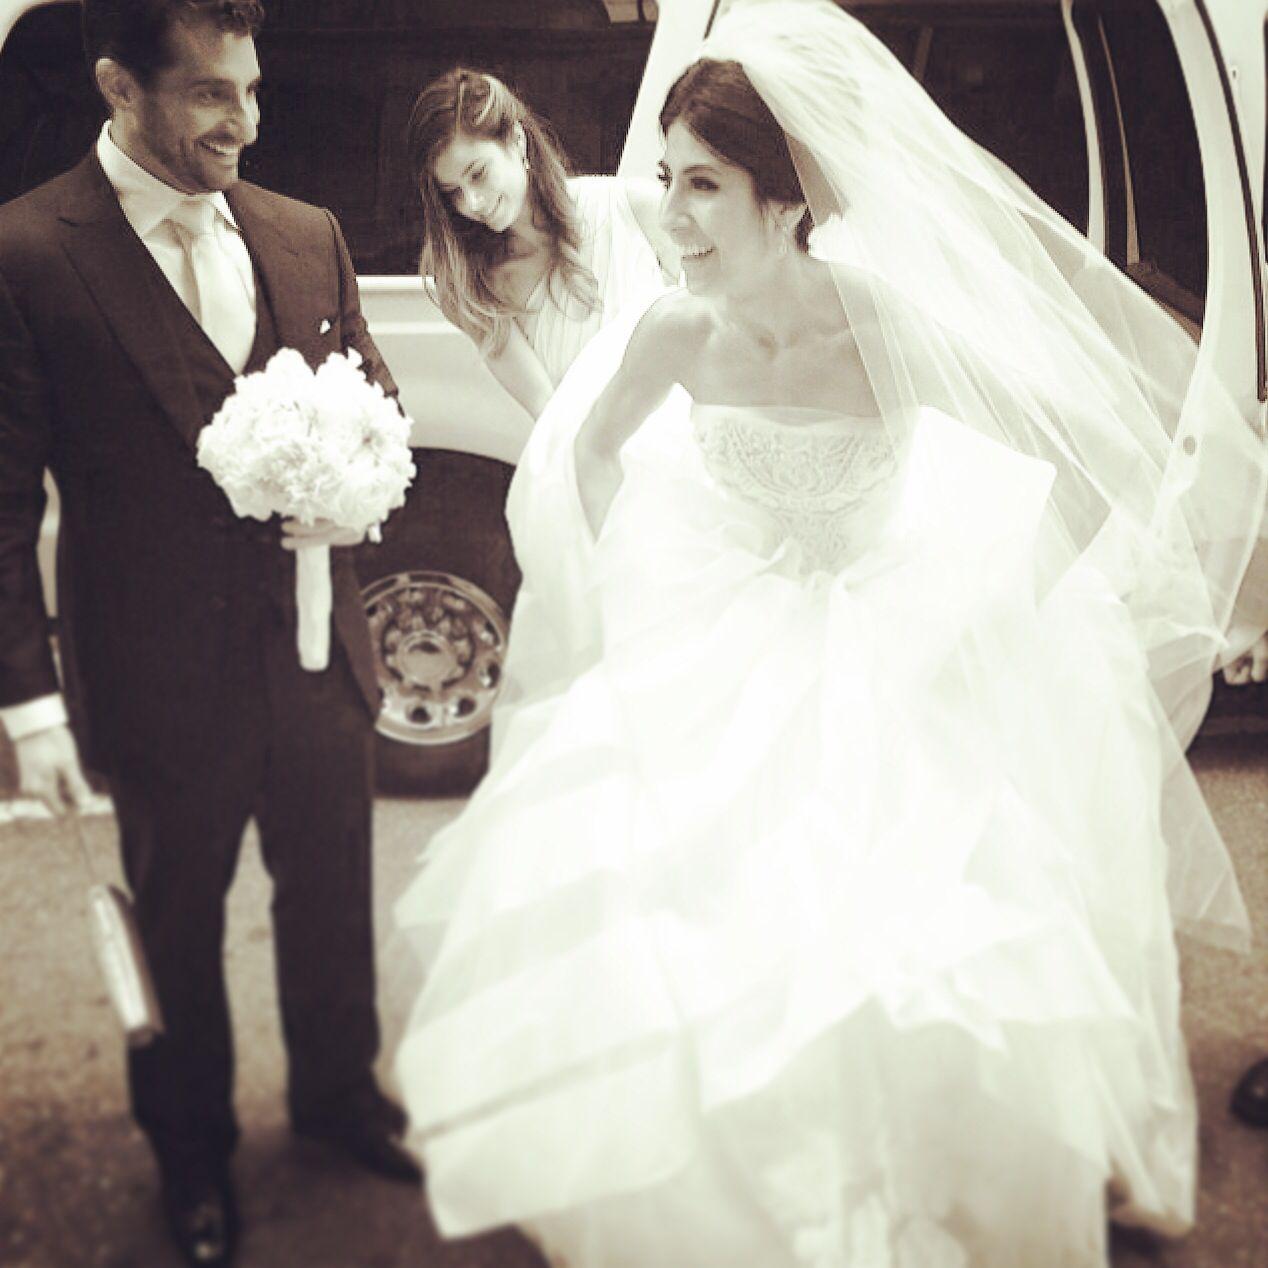 Classic wedding photo vera wang ball gown bridal elegant dress